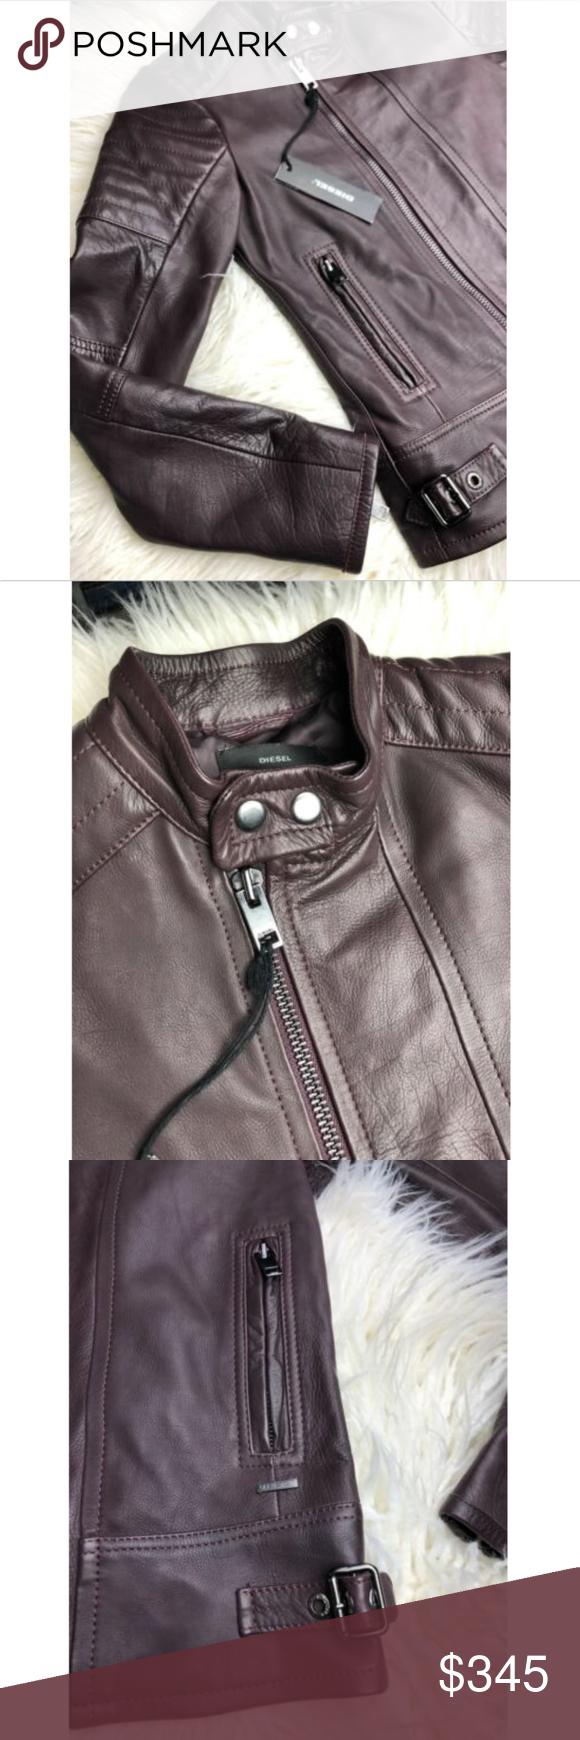 Diesel Women S Lily Moto Leather Zip Up Jacket Win Diesel Jacket Jackets Zip Ups [ 1740 x 580 Pixel ]